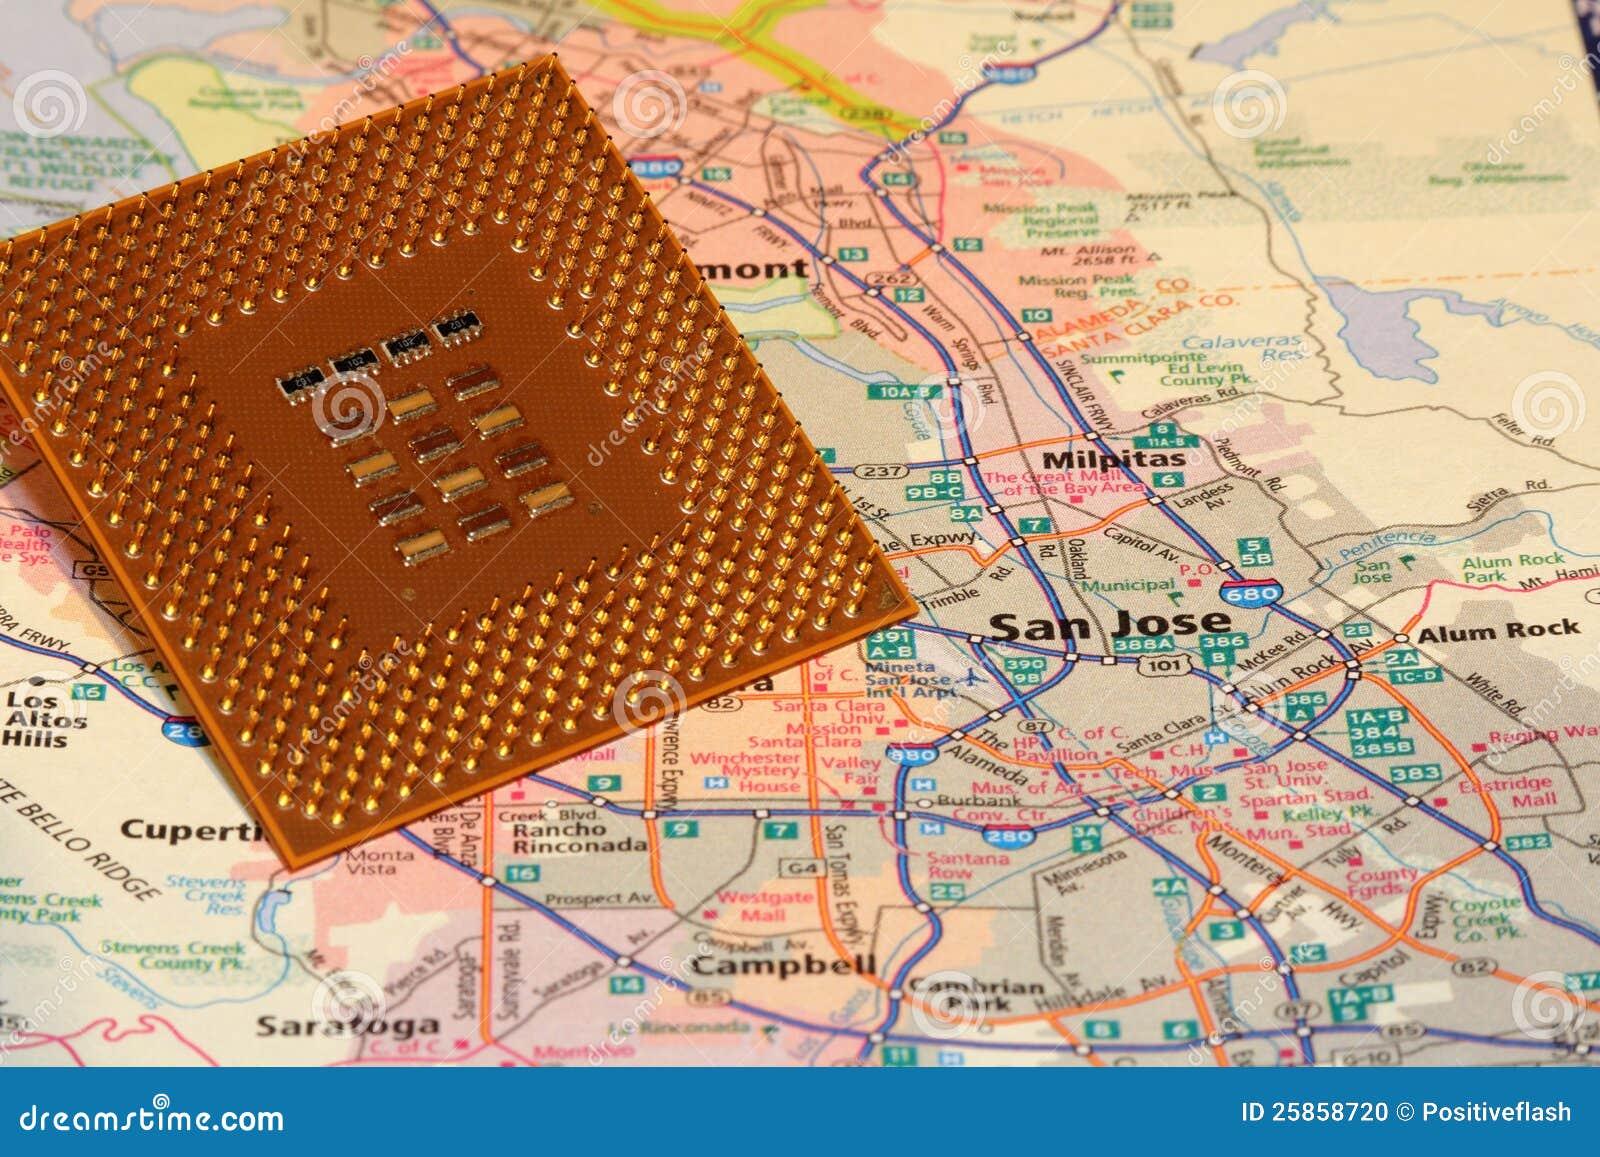 Map San Jose California Silicon Valley Stock Photo Image 25858720